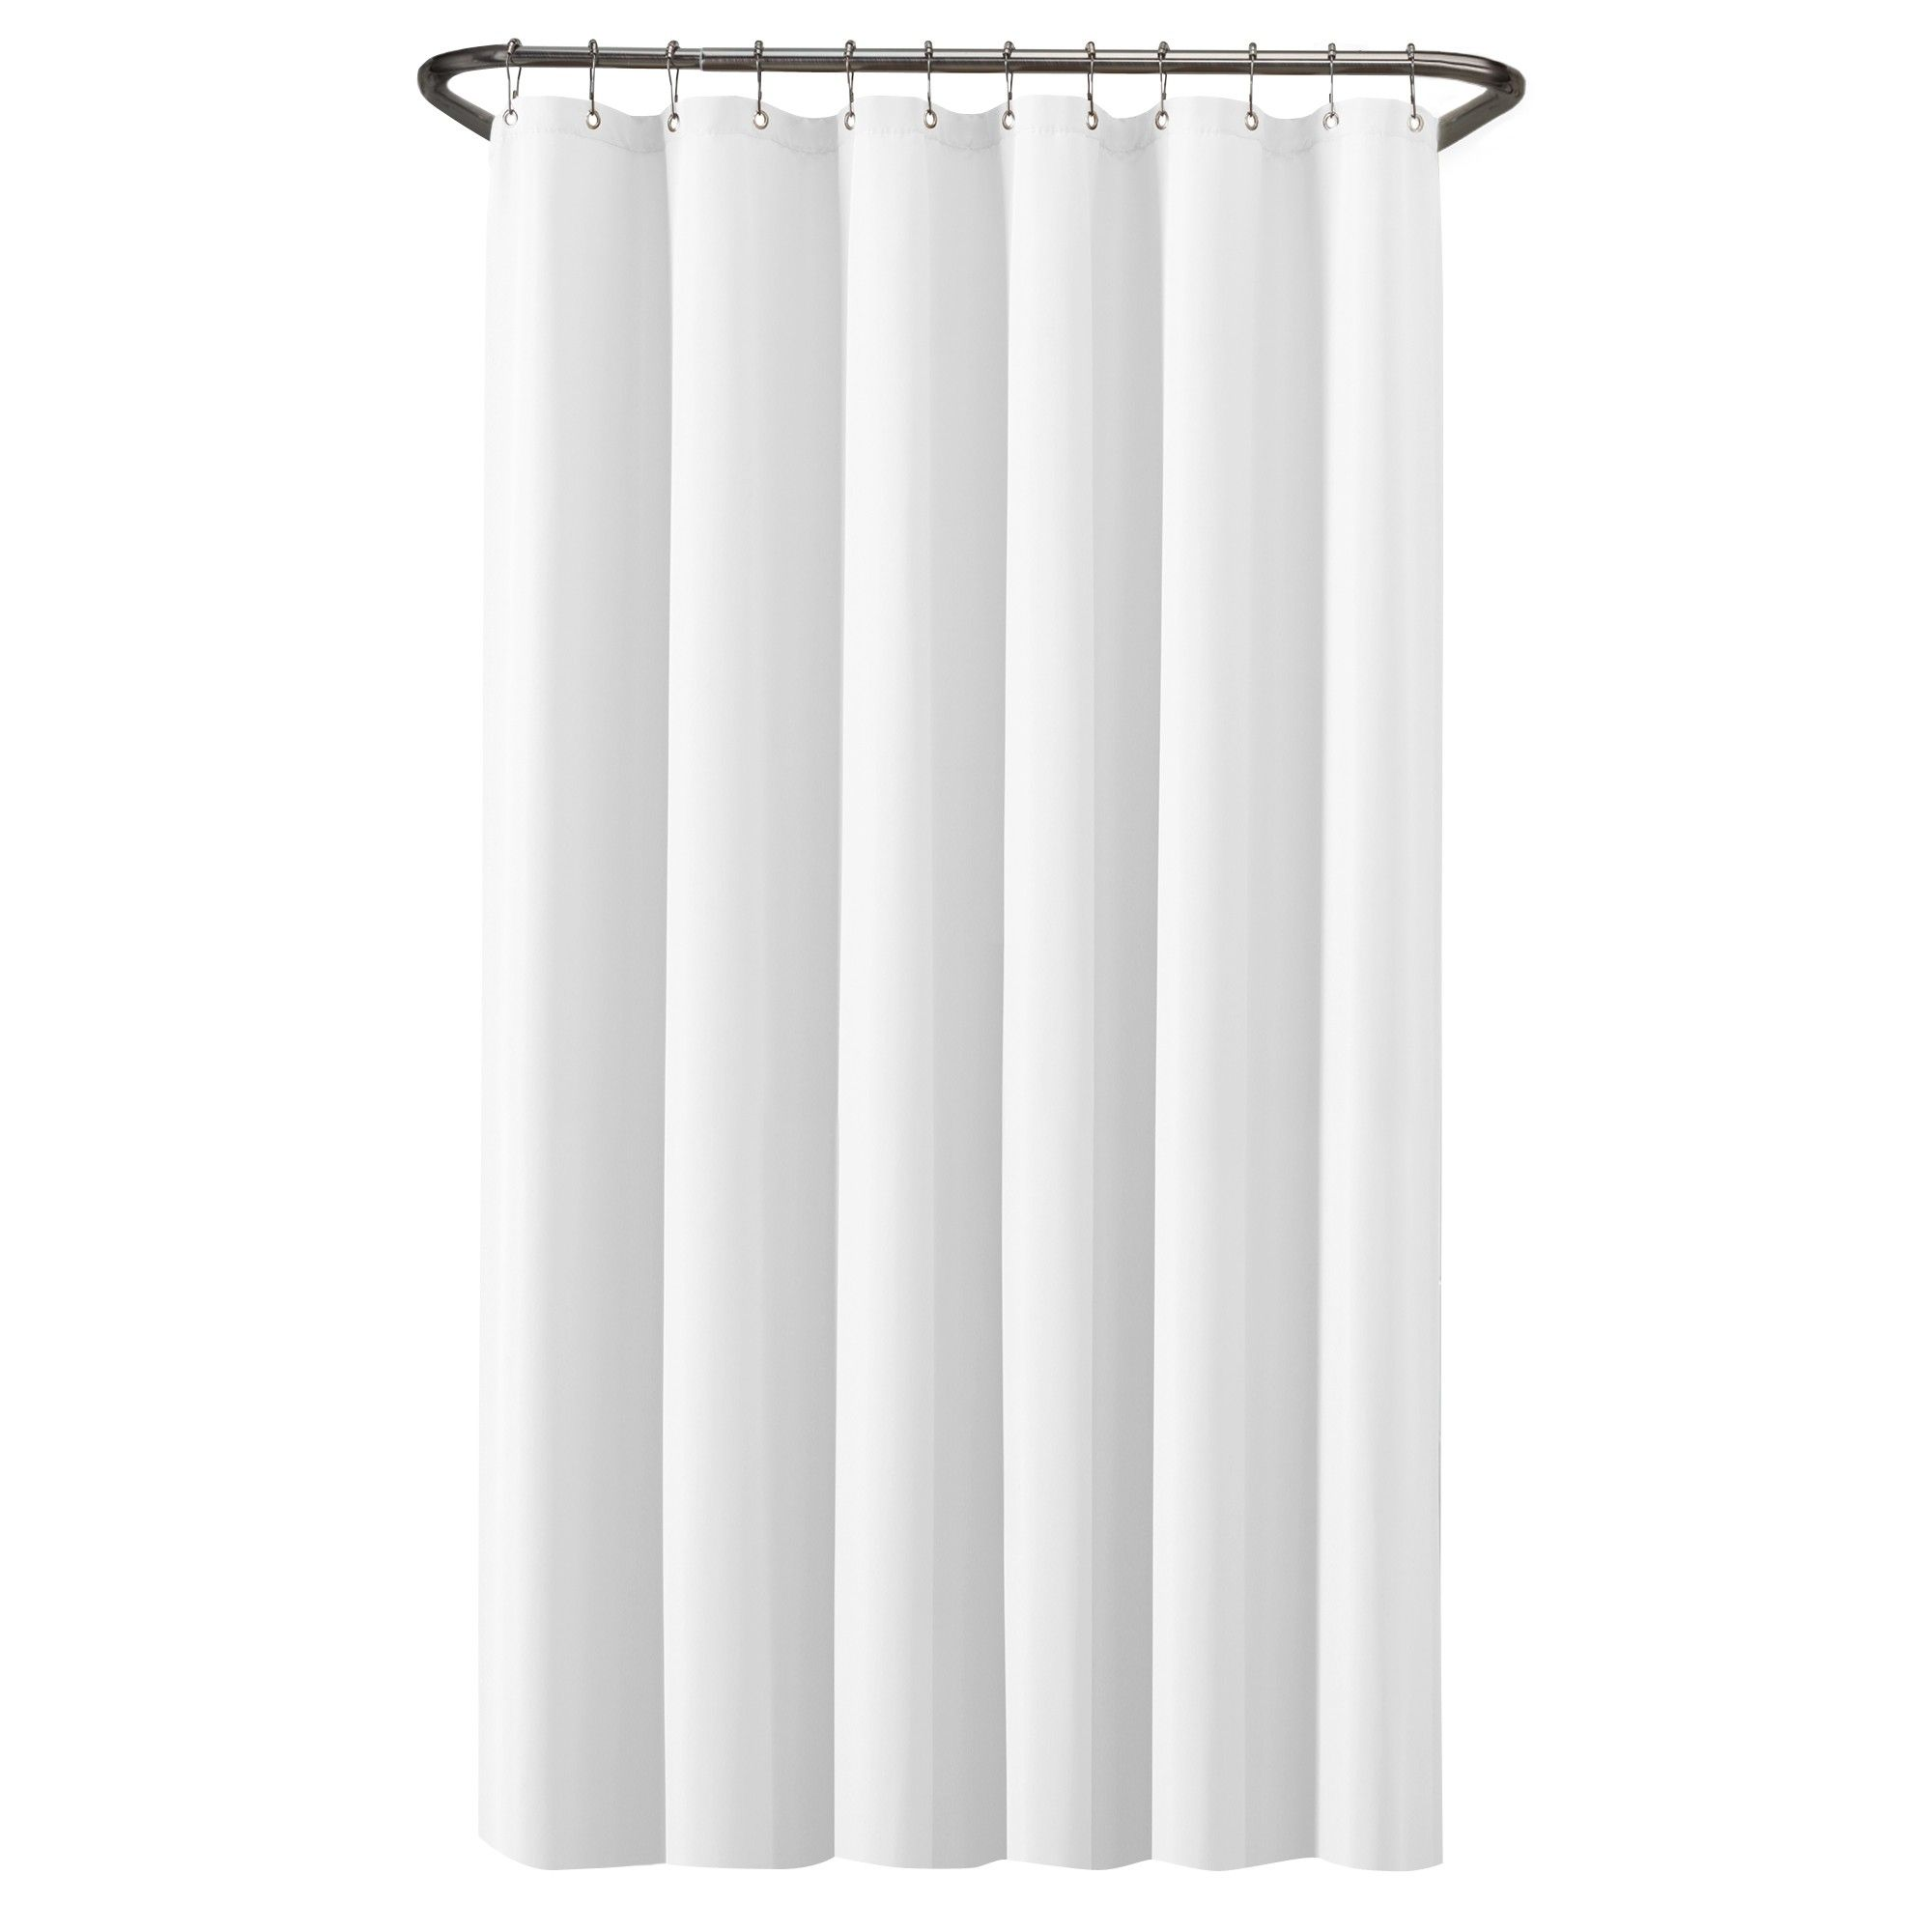 Waterproof Shower Liner White Maytex Adult Unisex Shower